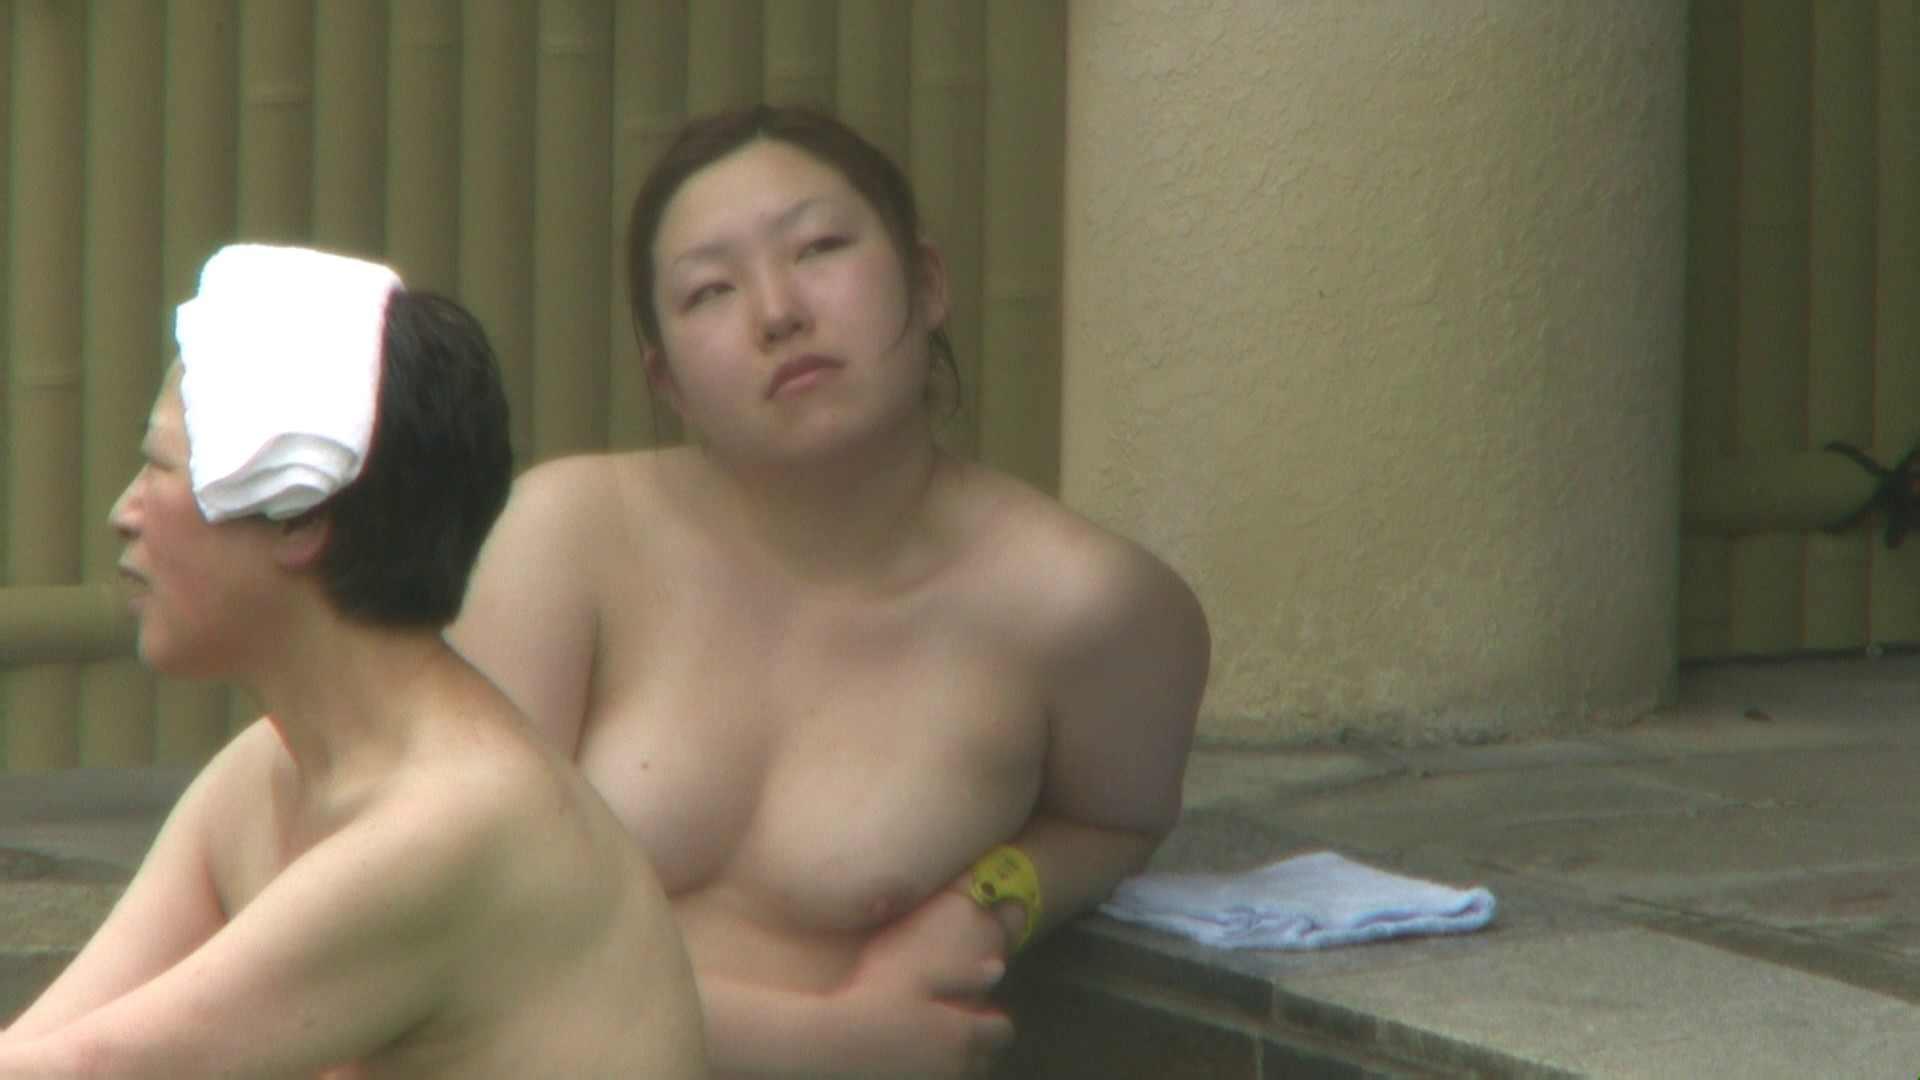 Aquaな露天風呂Vol.72【VIP限定】 盗撮 濡れ場動画紹介 25PICs 8